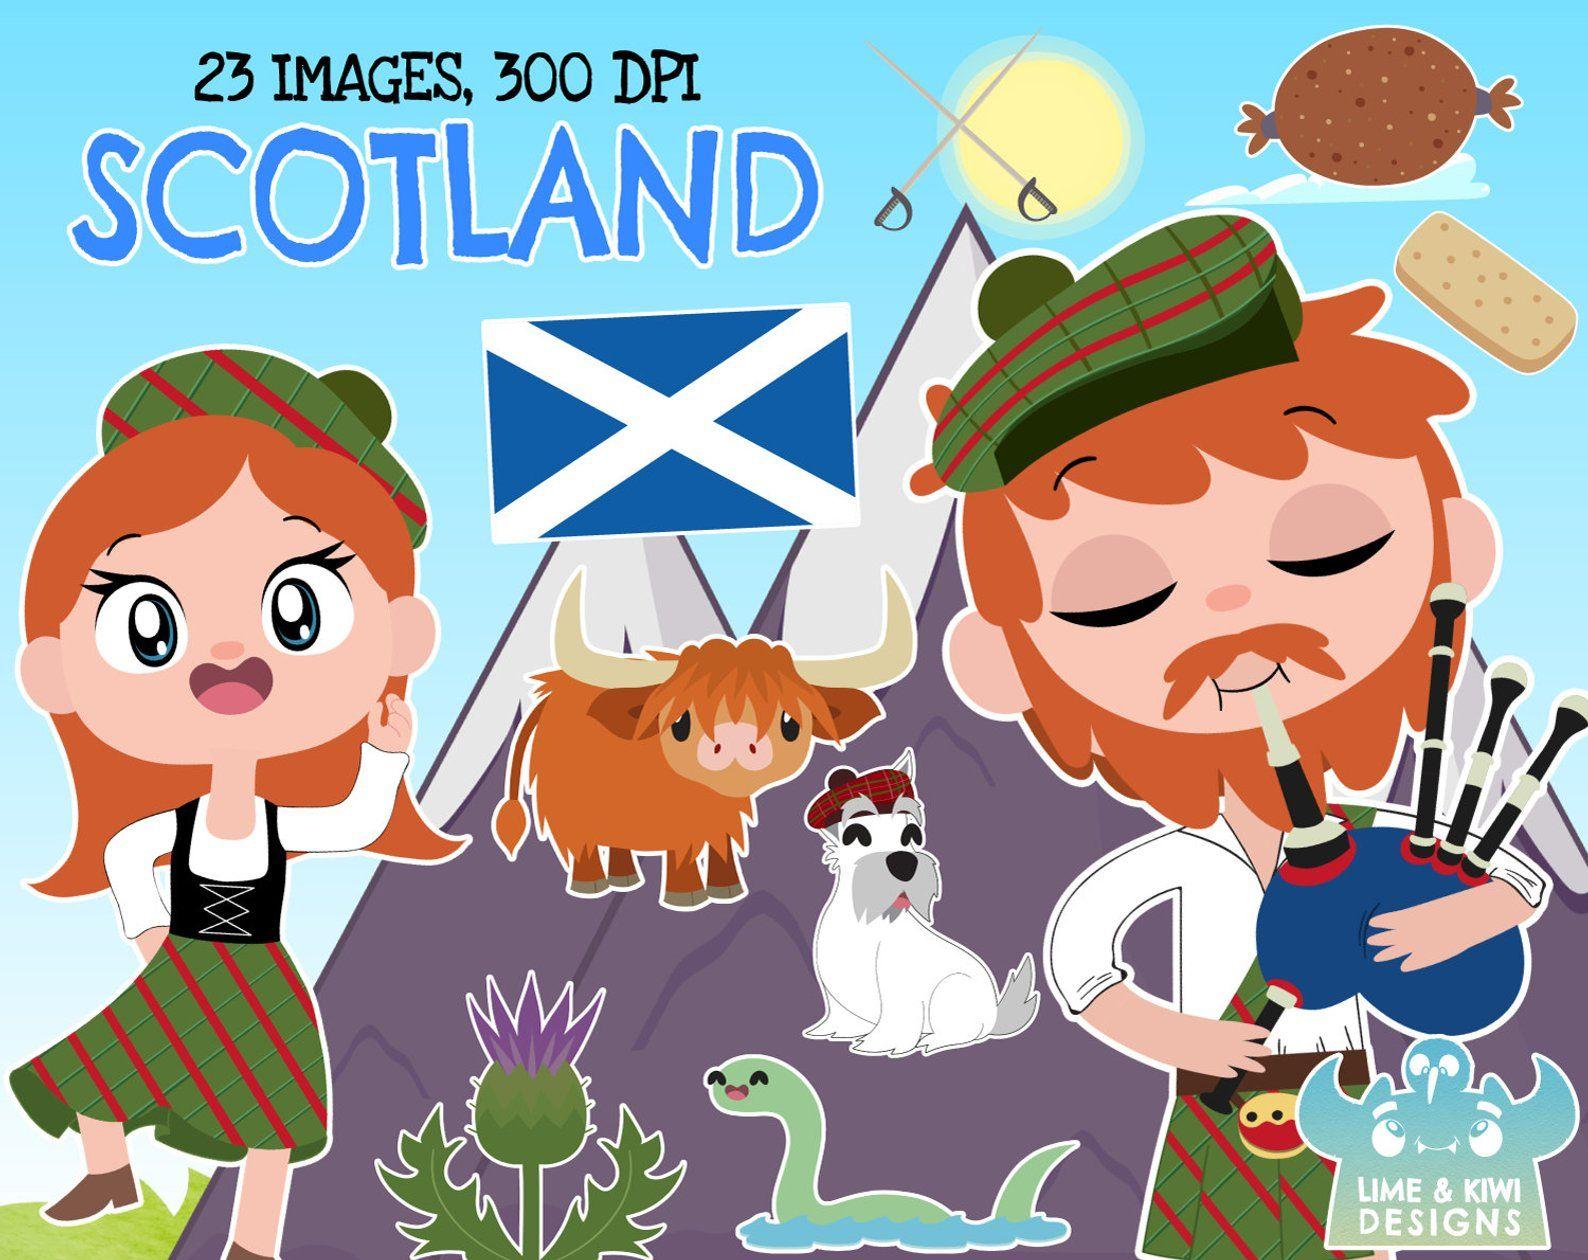 Scotland Clipart, Instant Download Vector Art, Commercial